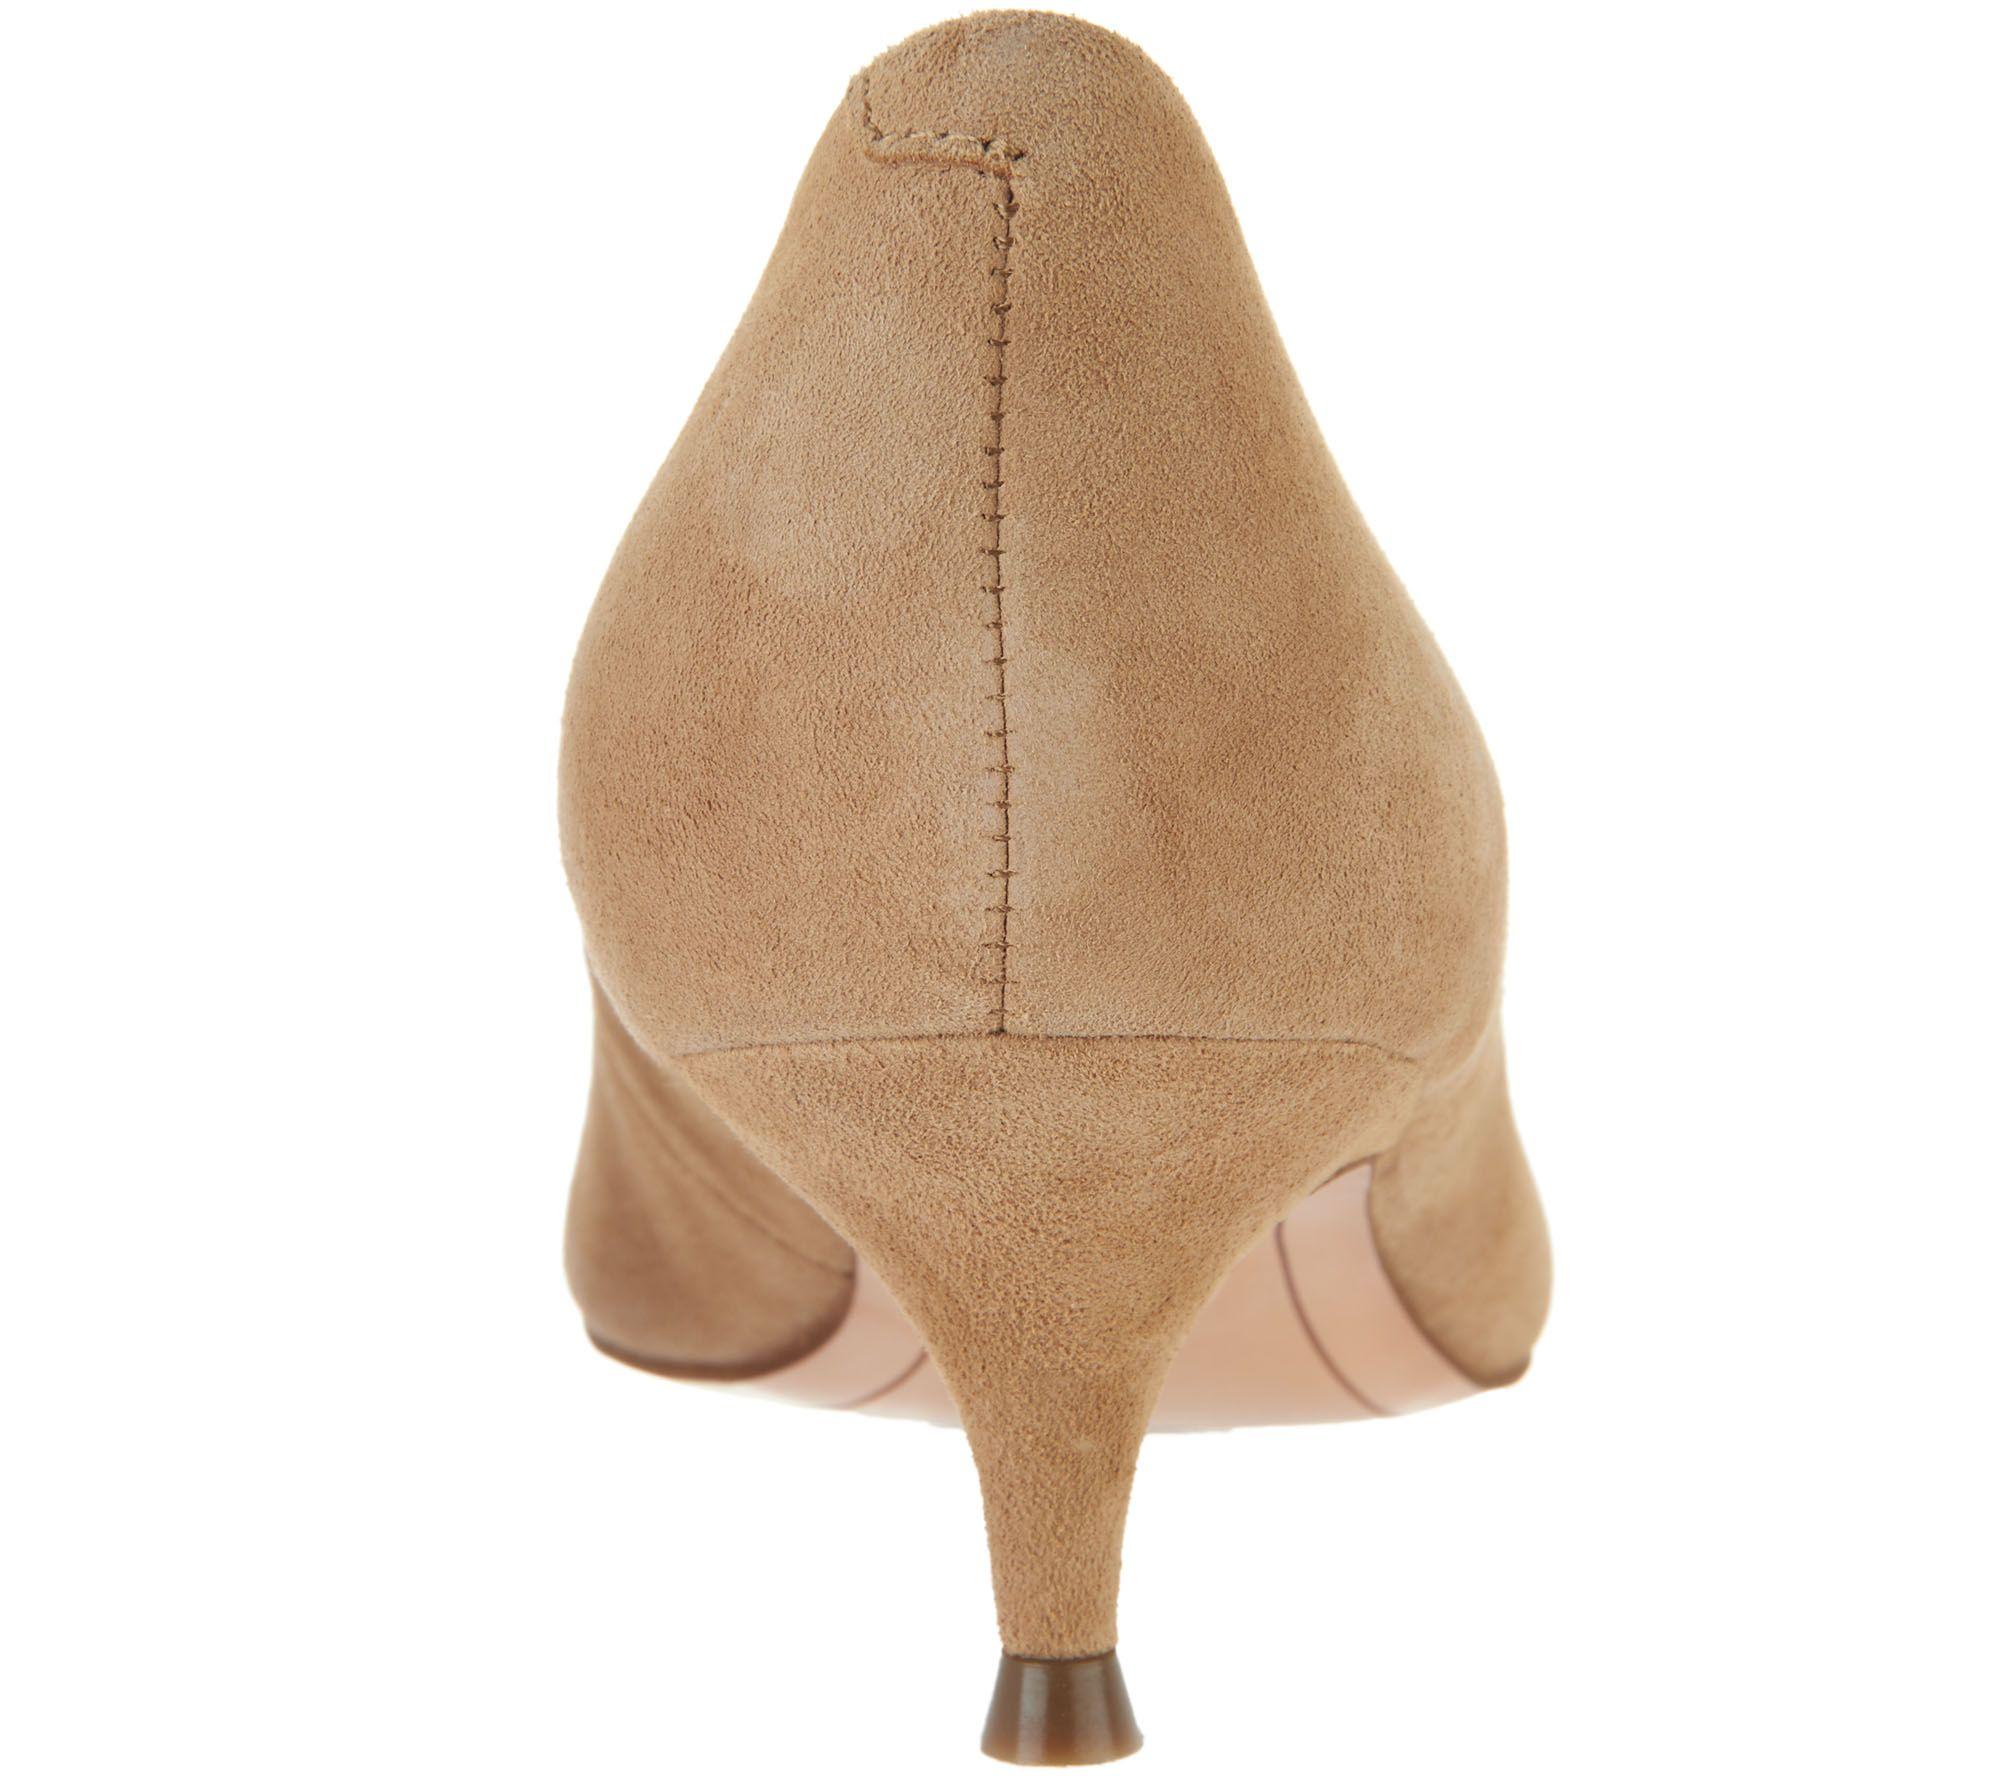 1674147d157f Vionic Leather Kitten Heel Pumps - Josie - Page 1 — QVC.com